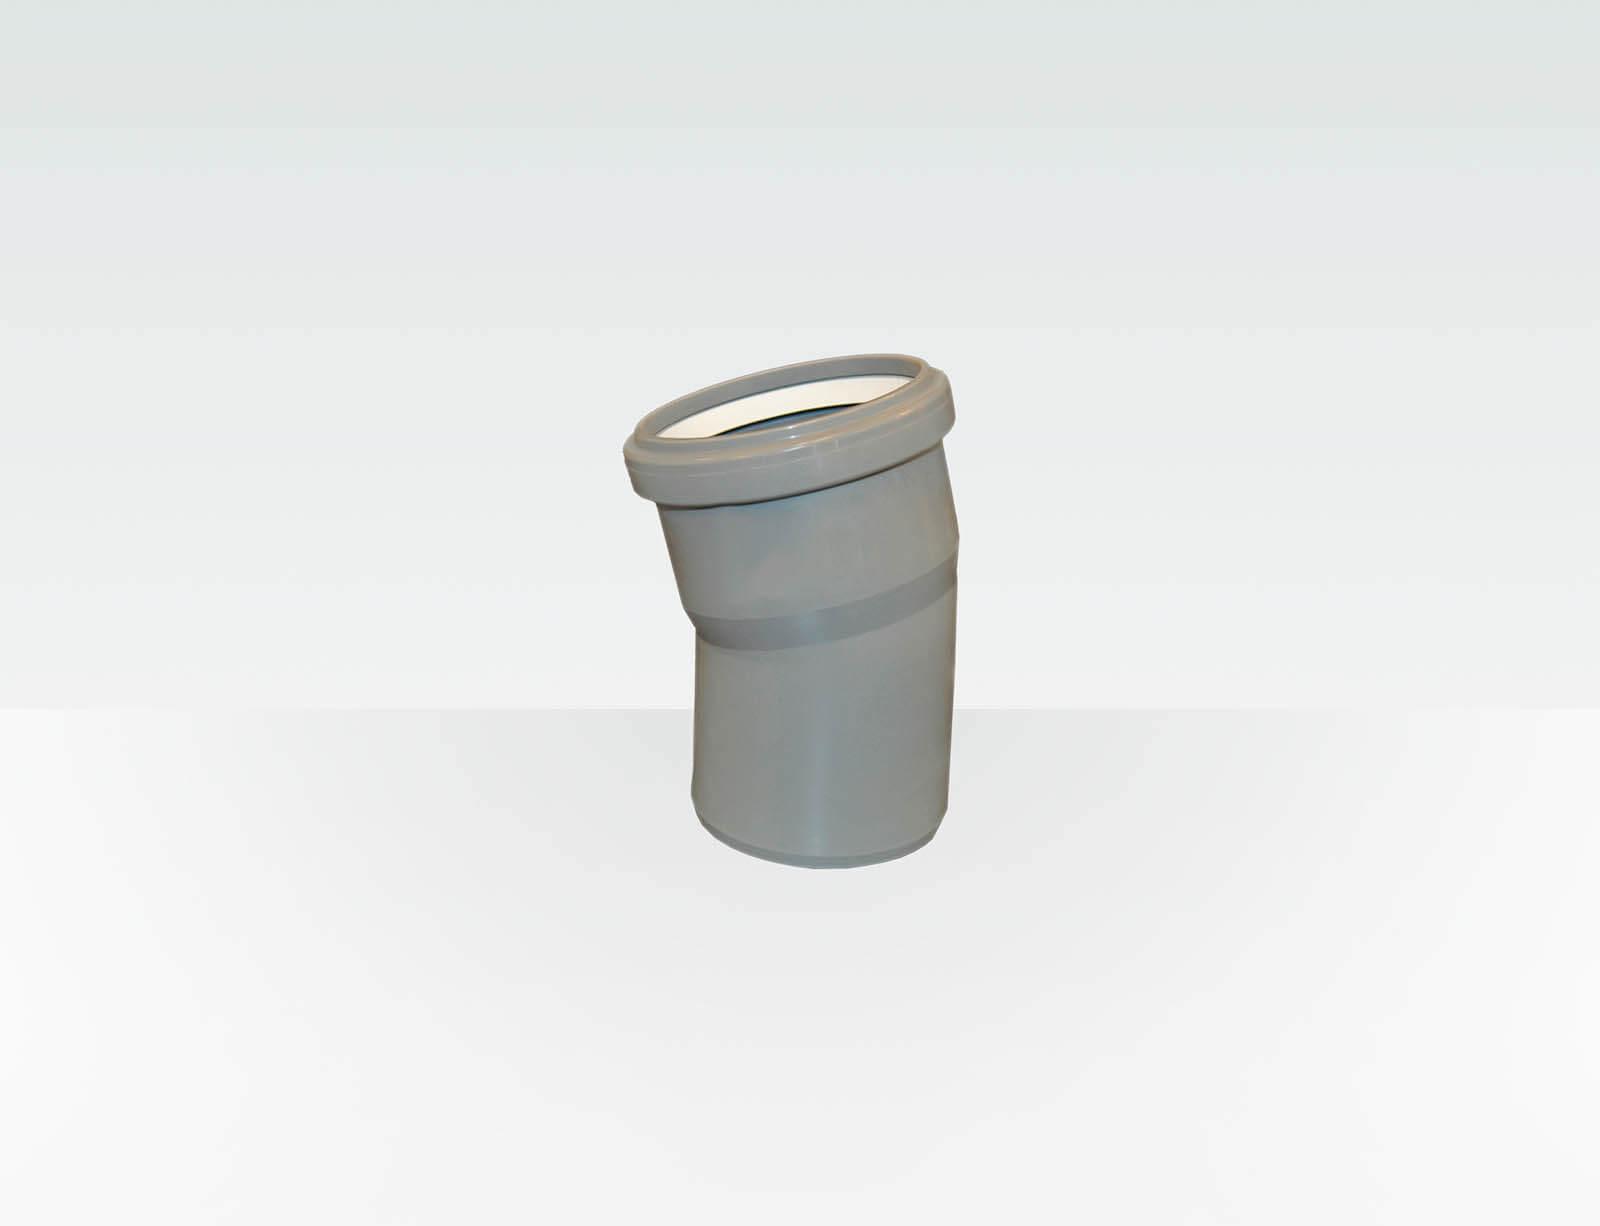 productfoto 15° Elbow